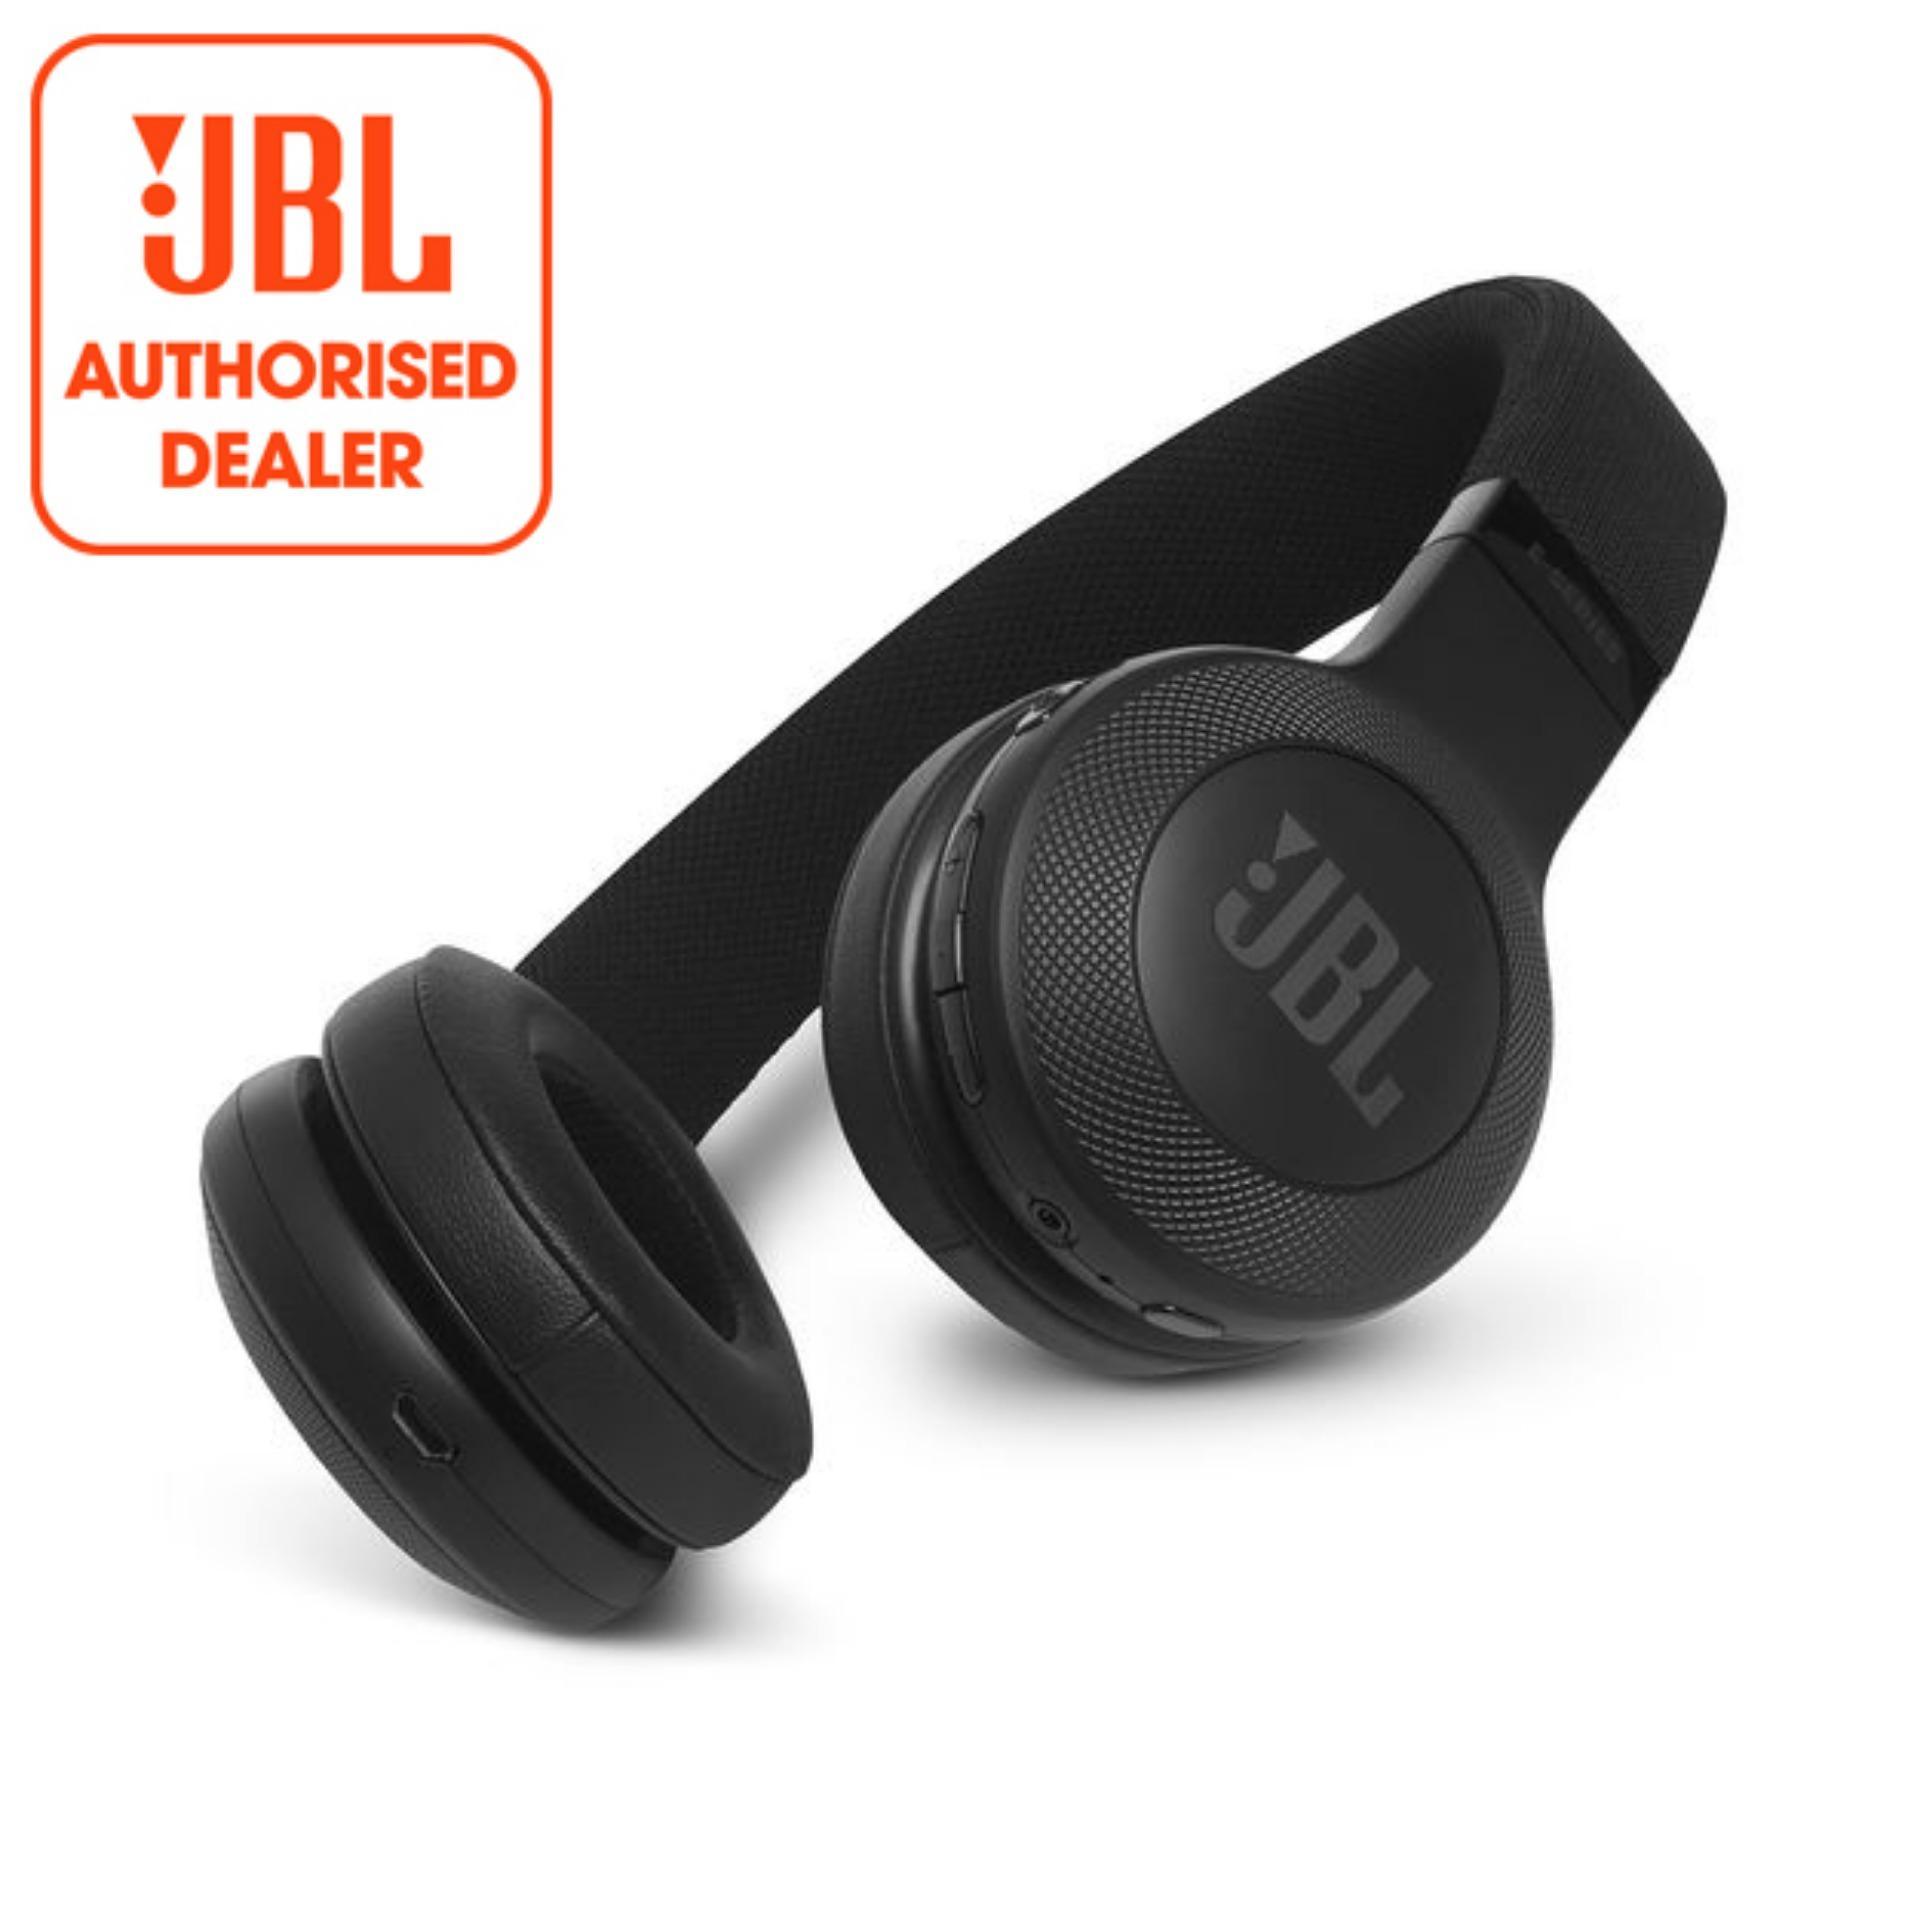 Price Comparisons For Jbl E45Bt Wireless On Ear Headphones